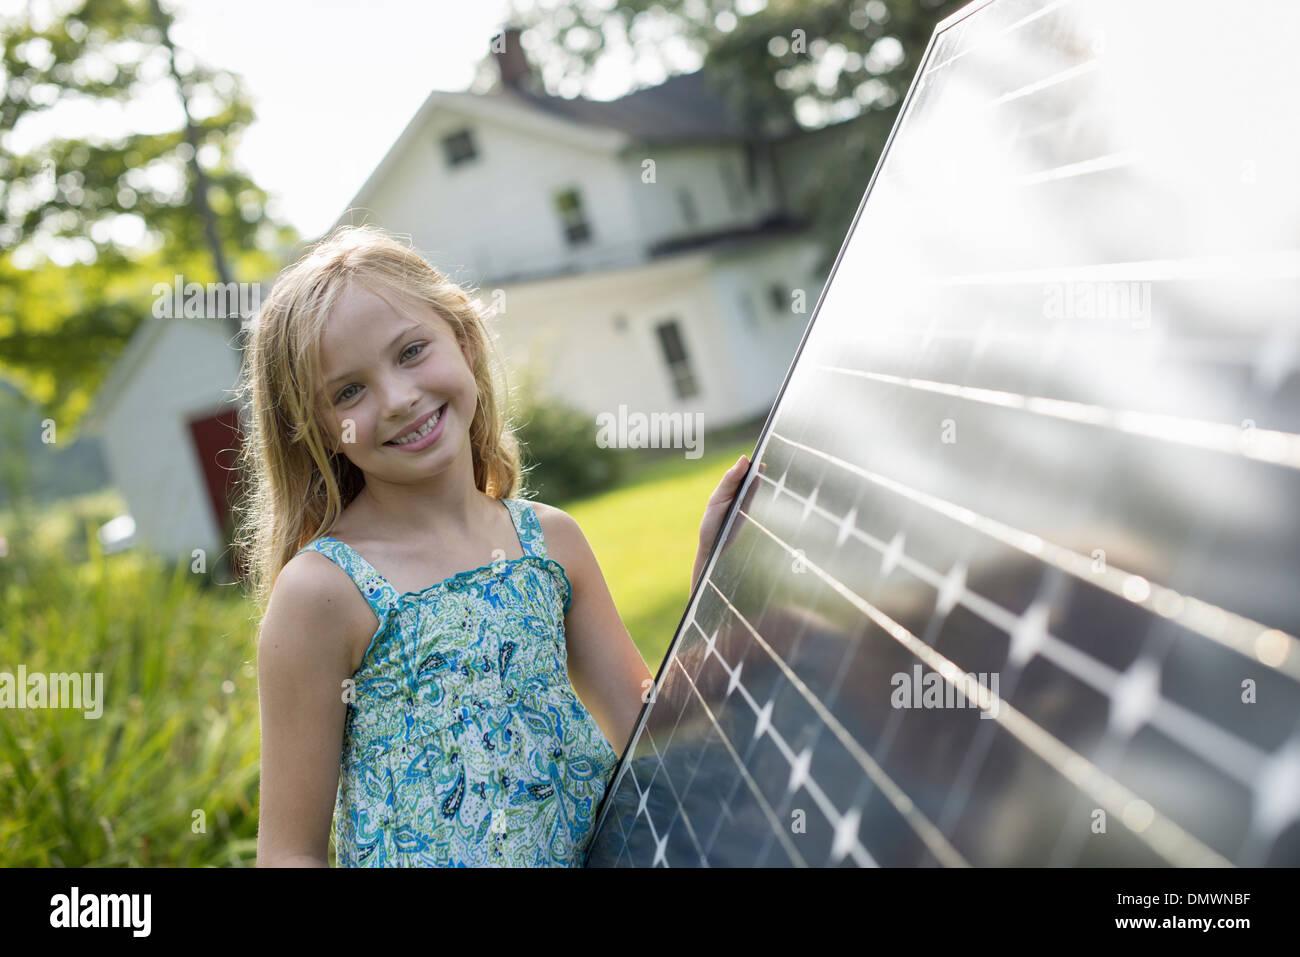 A young girl beside a large solar panel in a farmhouse garden. - Stock Image